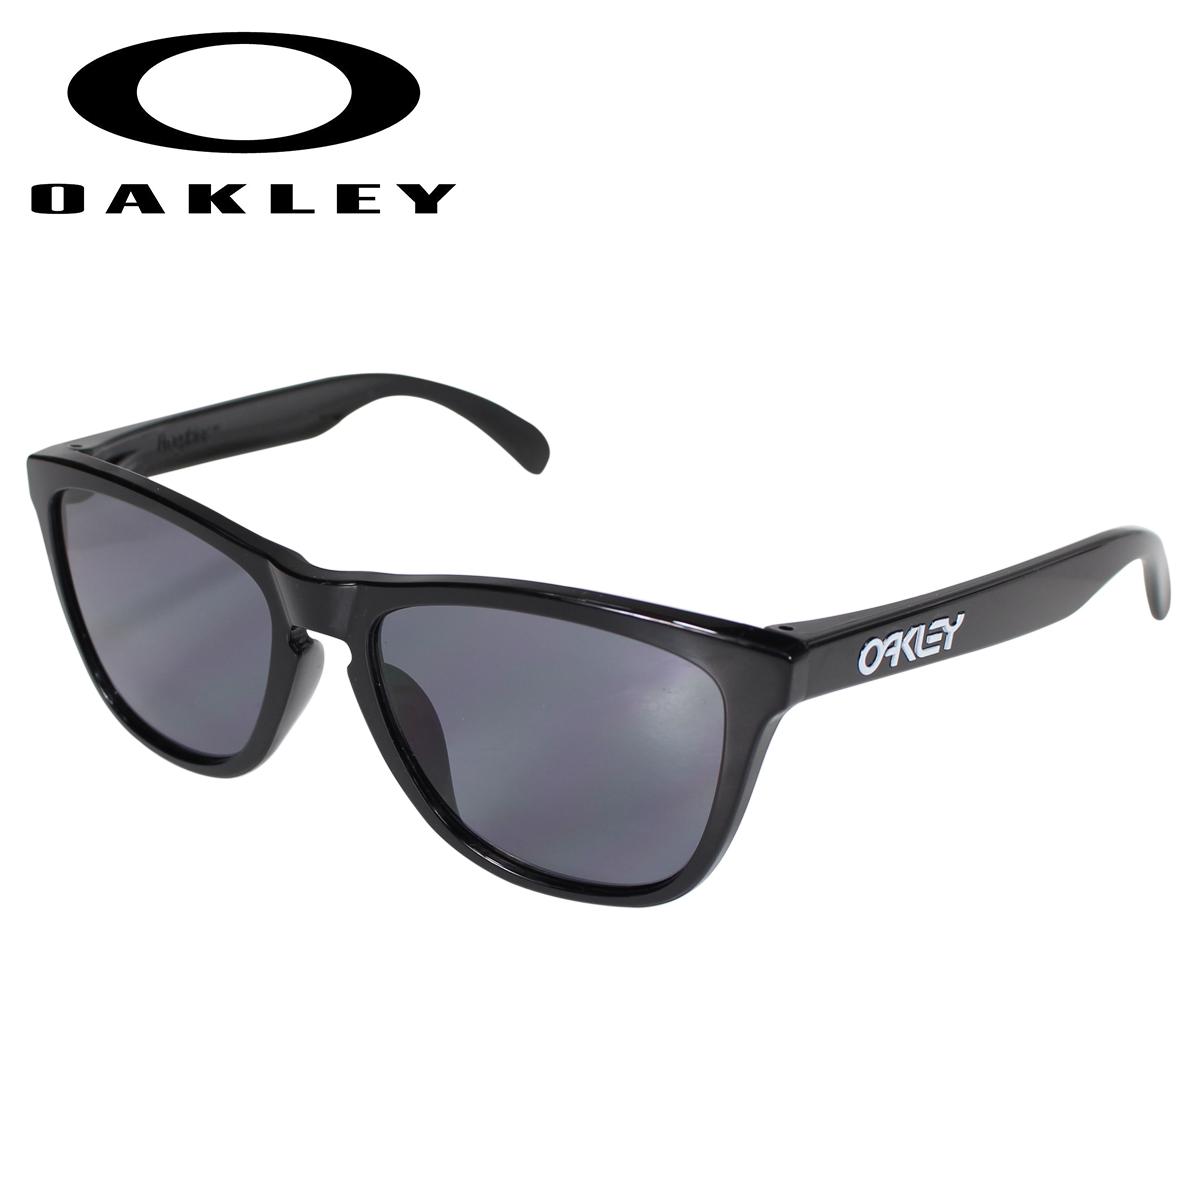 Oakley オークリー サングラス フロッグスキン アジアンフィット メンズ レディース Frogskins ASIAN FIT ブラック OO9245-01